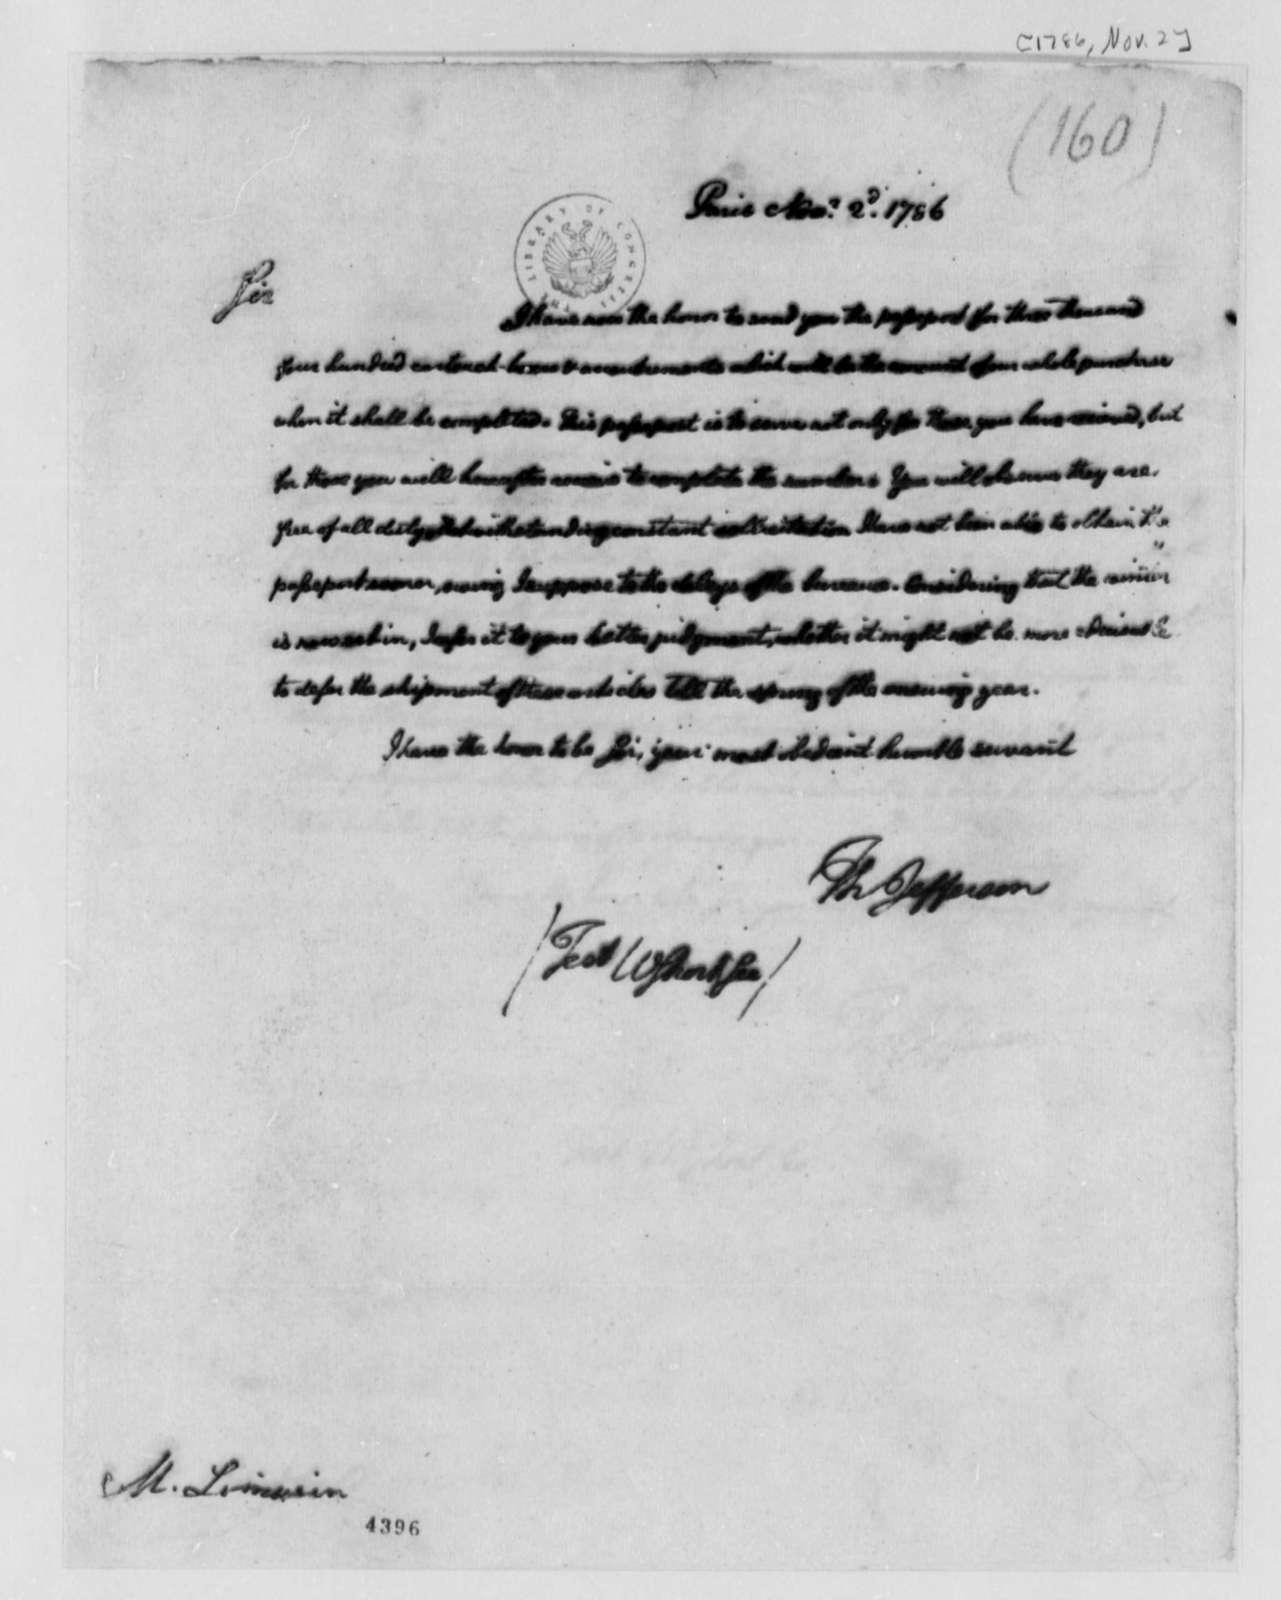 Thomas Jefferson to Andre Limozin, November 2, 1786